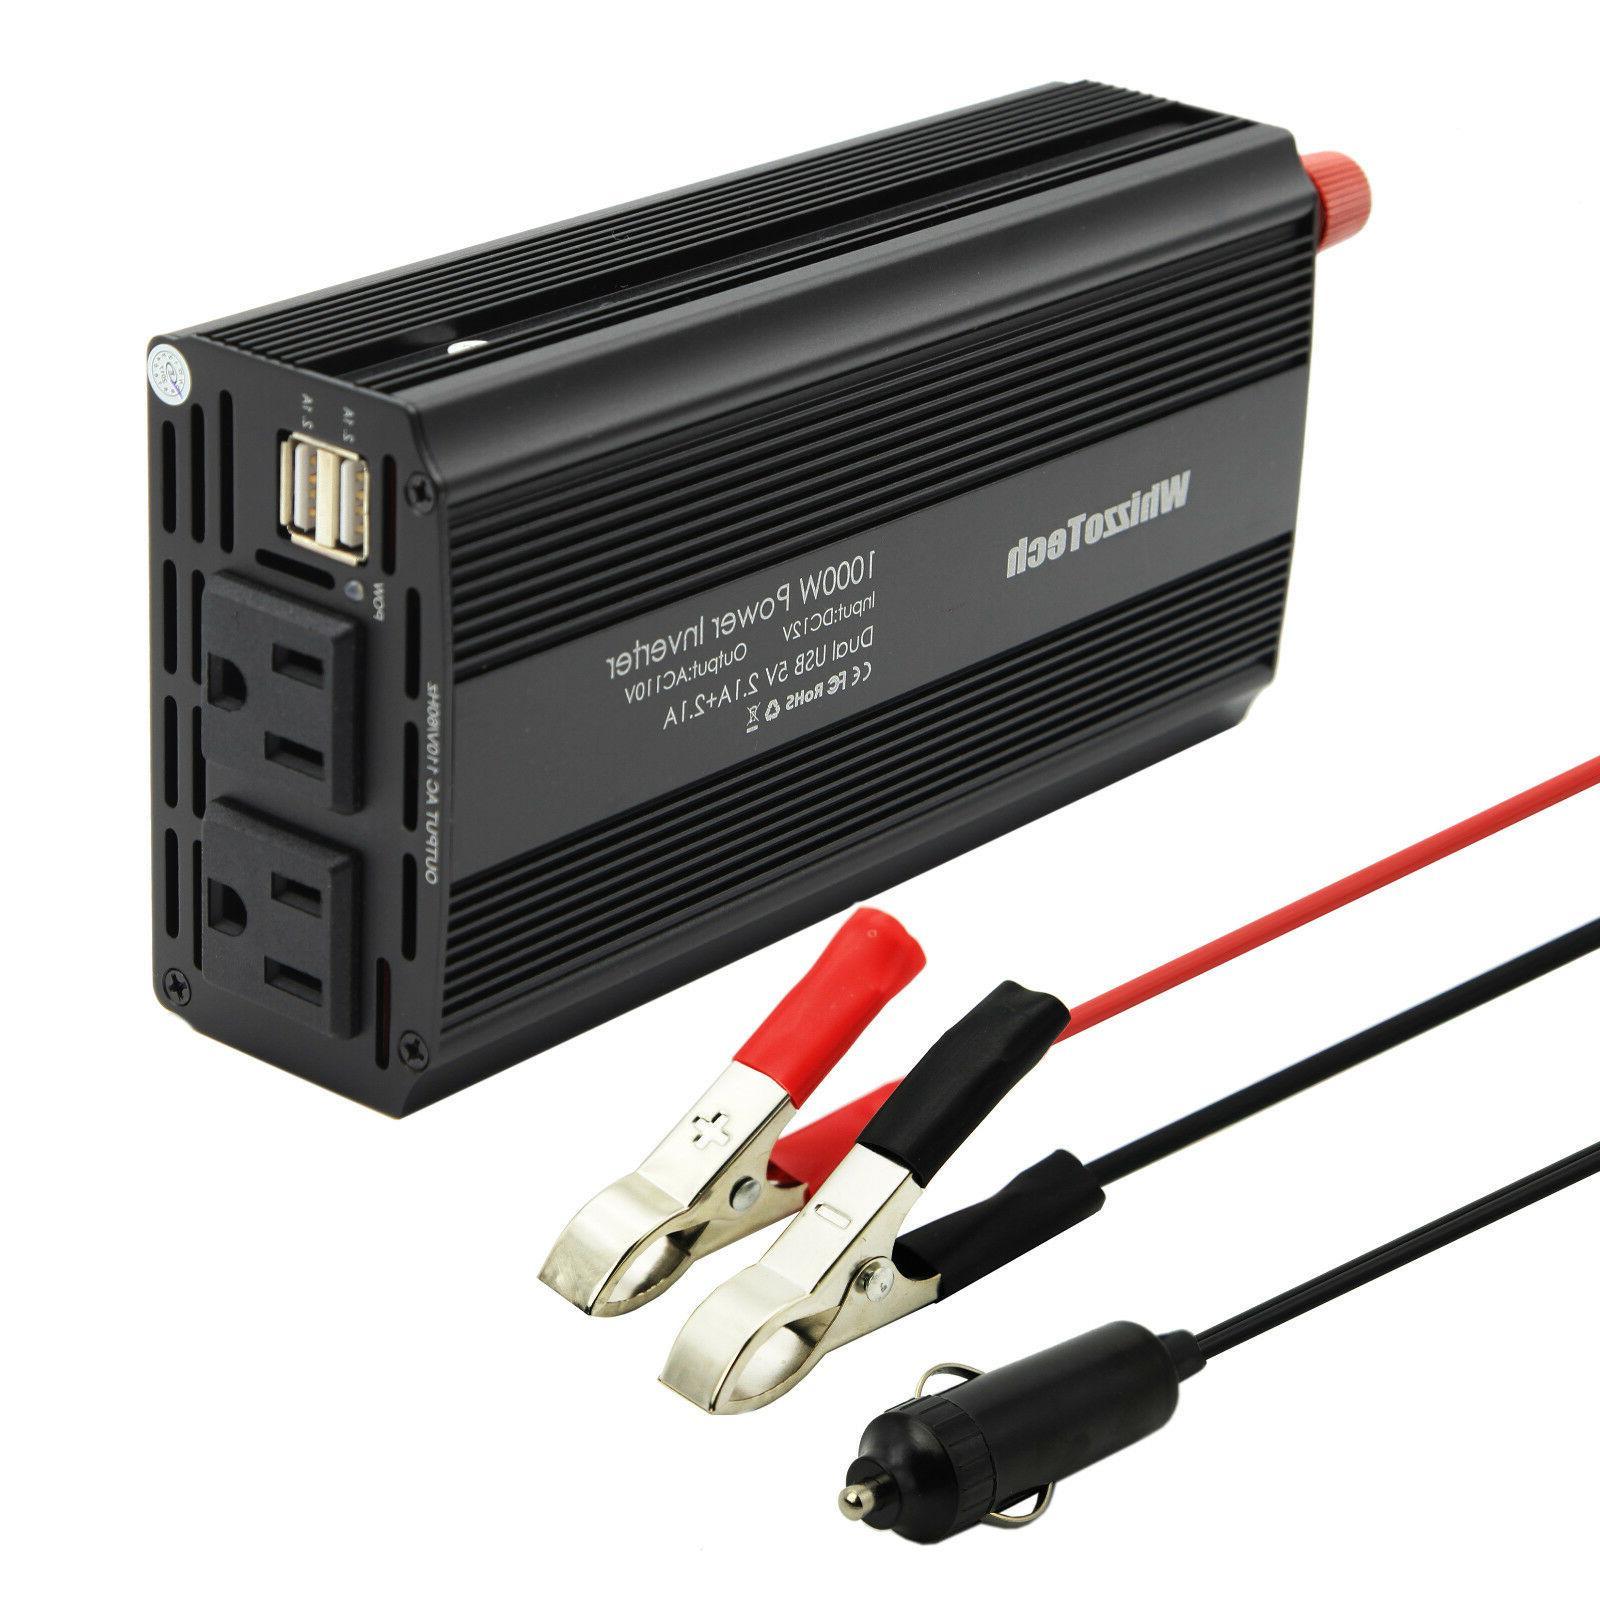 1000W 2000W Car Power Inverter DC AC 110V AC Outlets